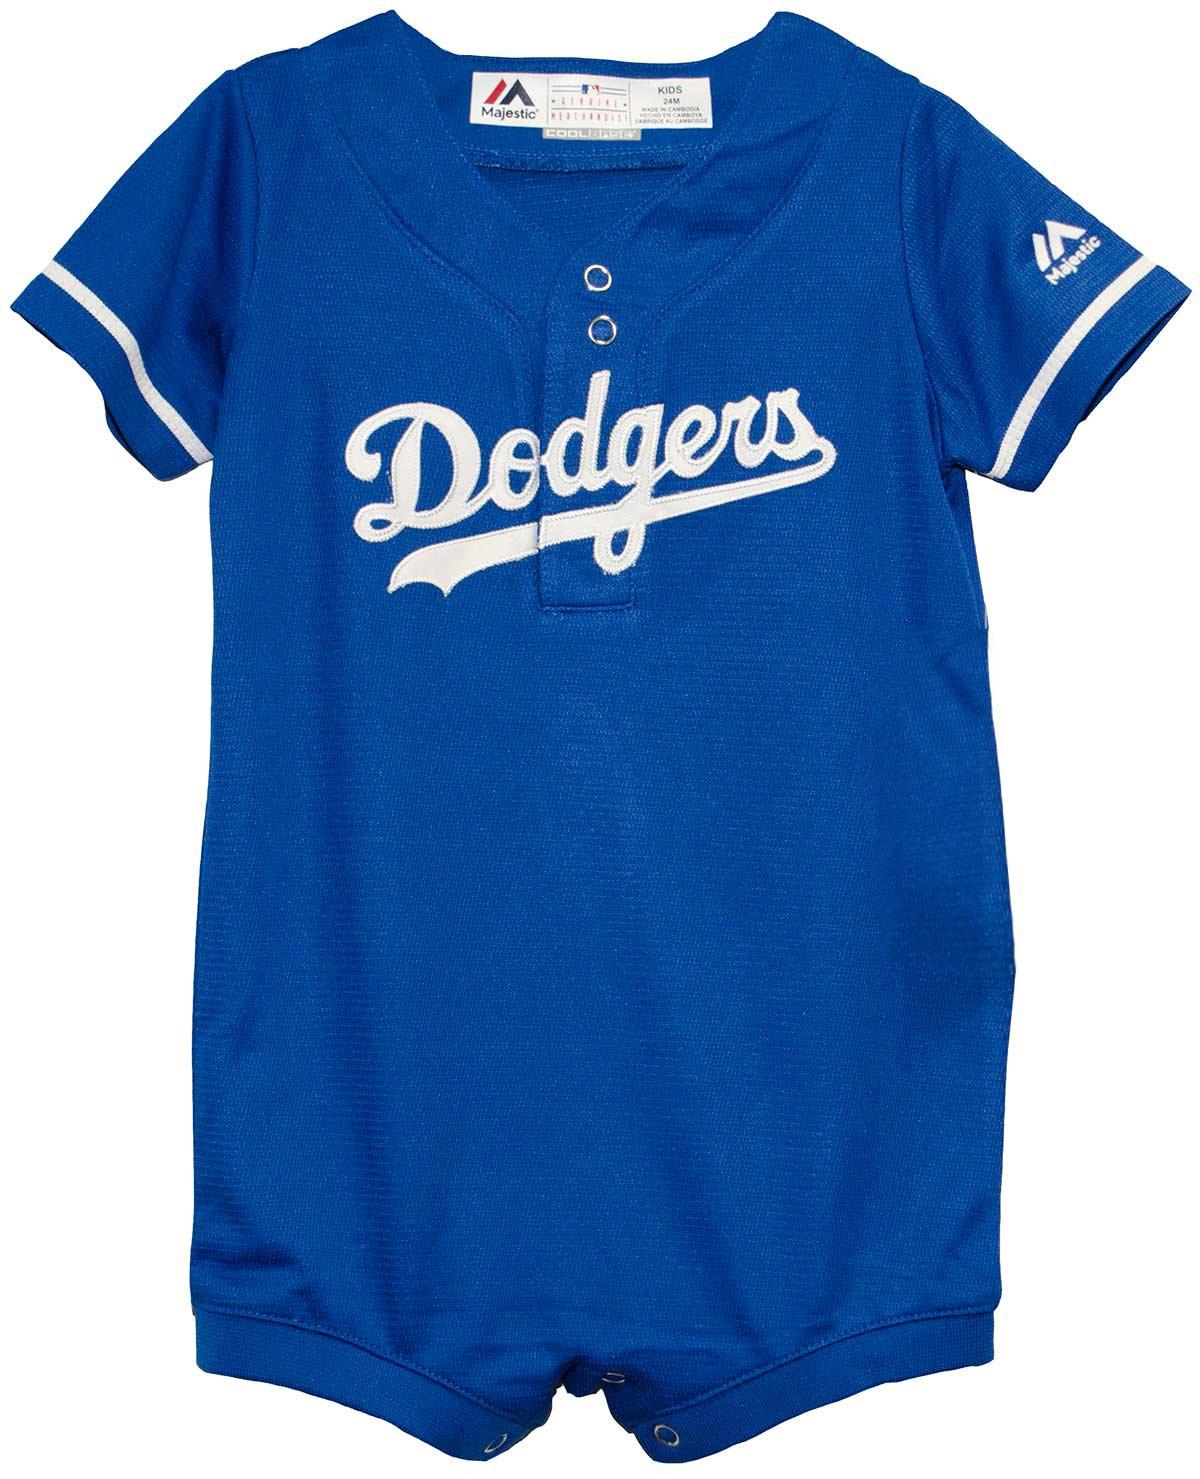 719ca3854 Majestic Los Angeles Dodgers Blue Alternate Cool Base Romper Jersey  Outerstuff